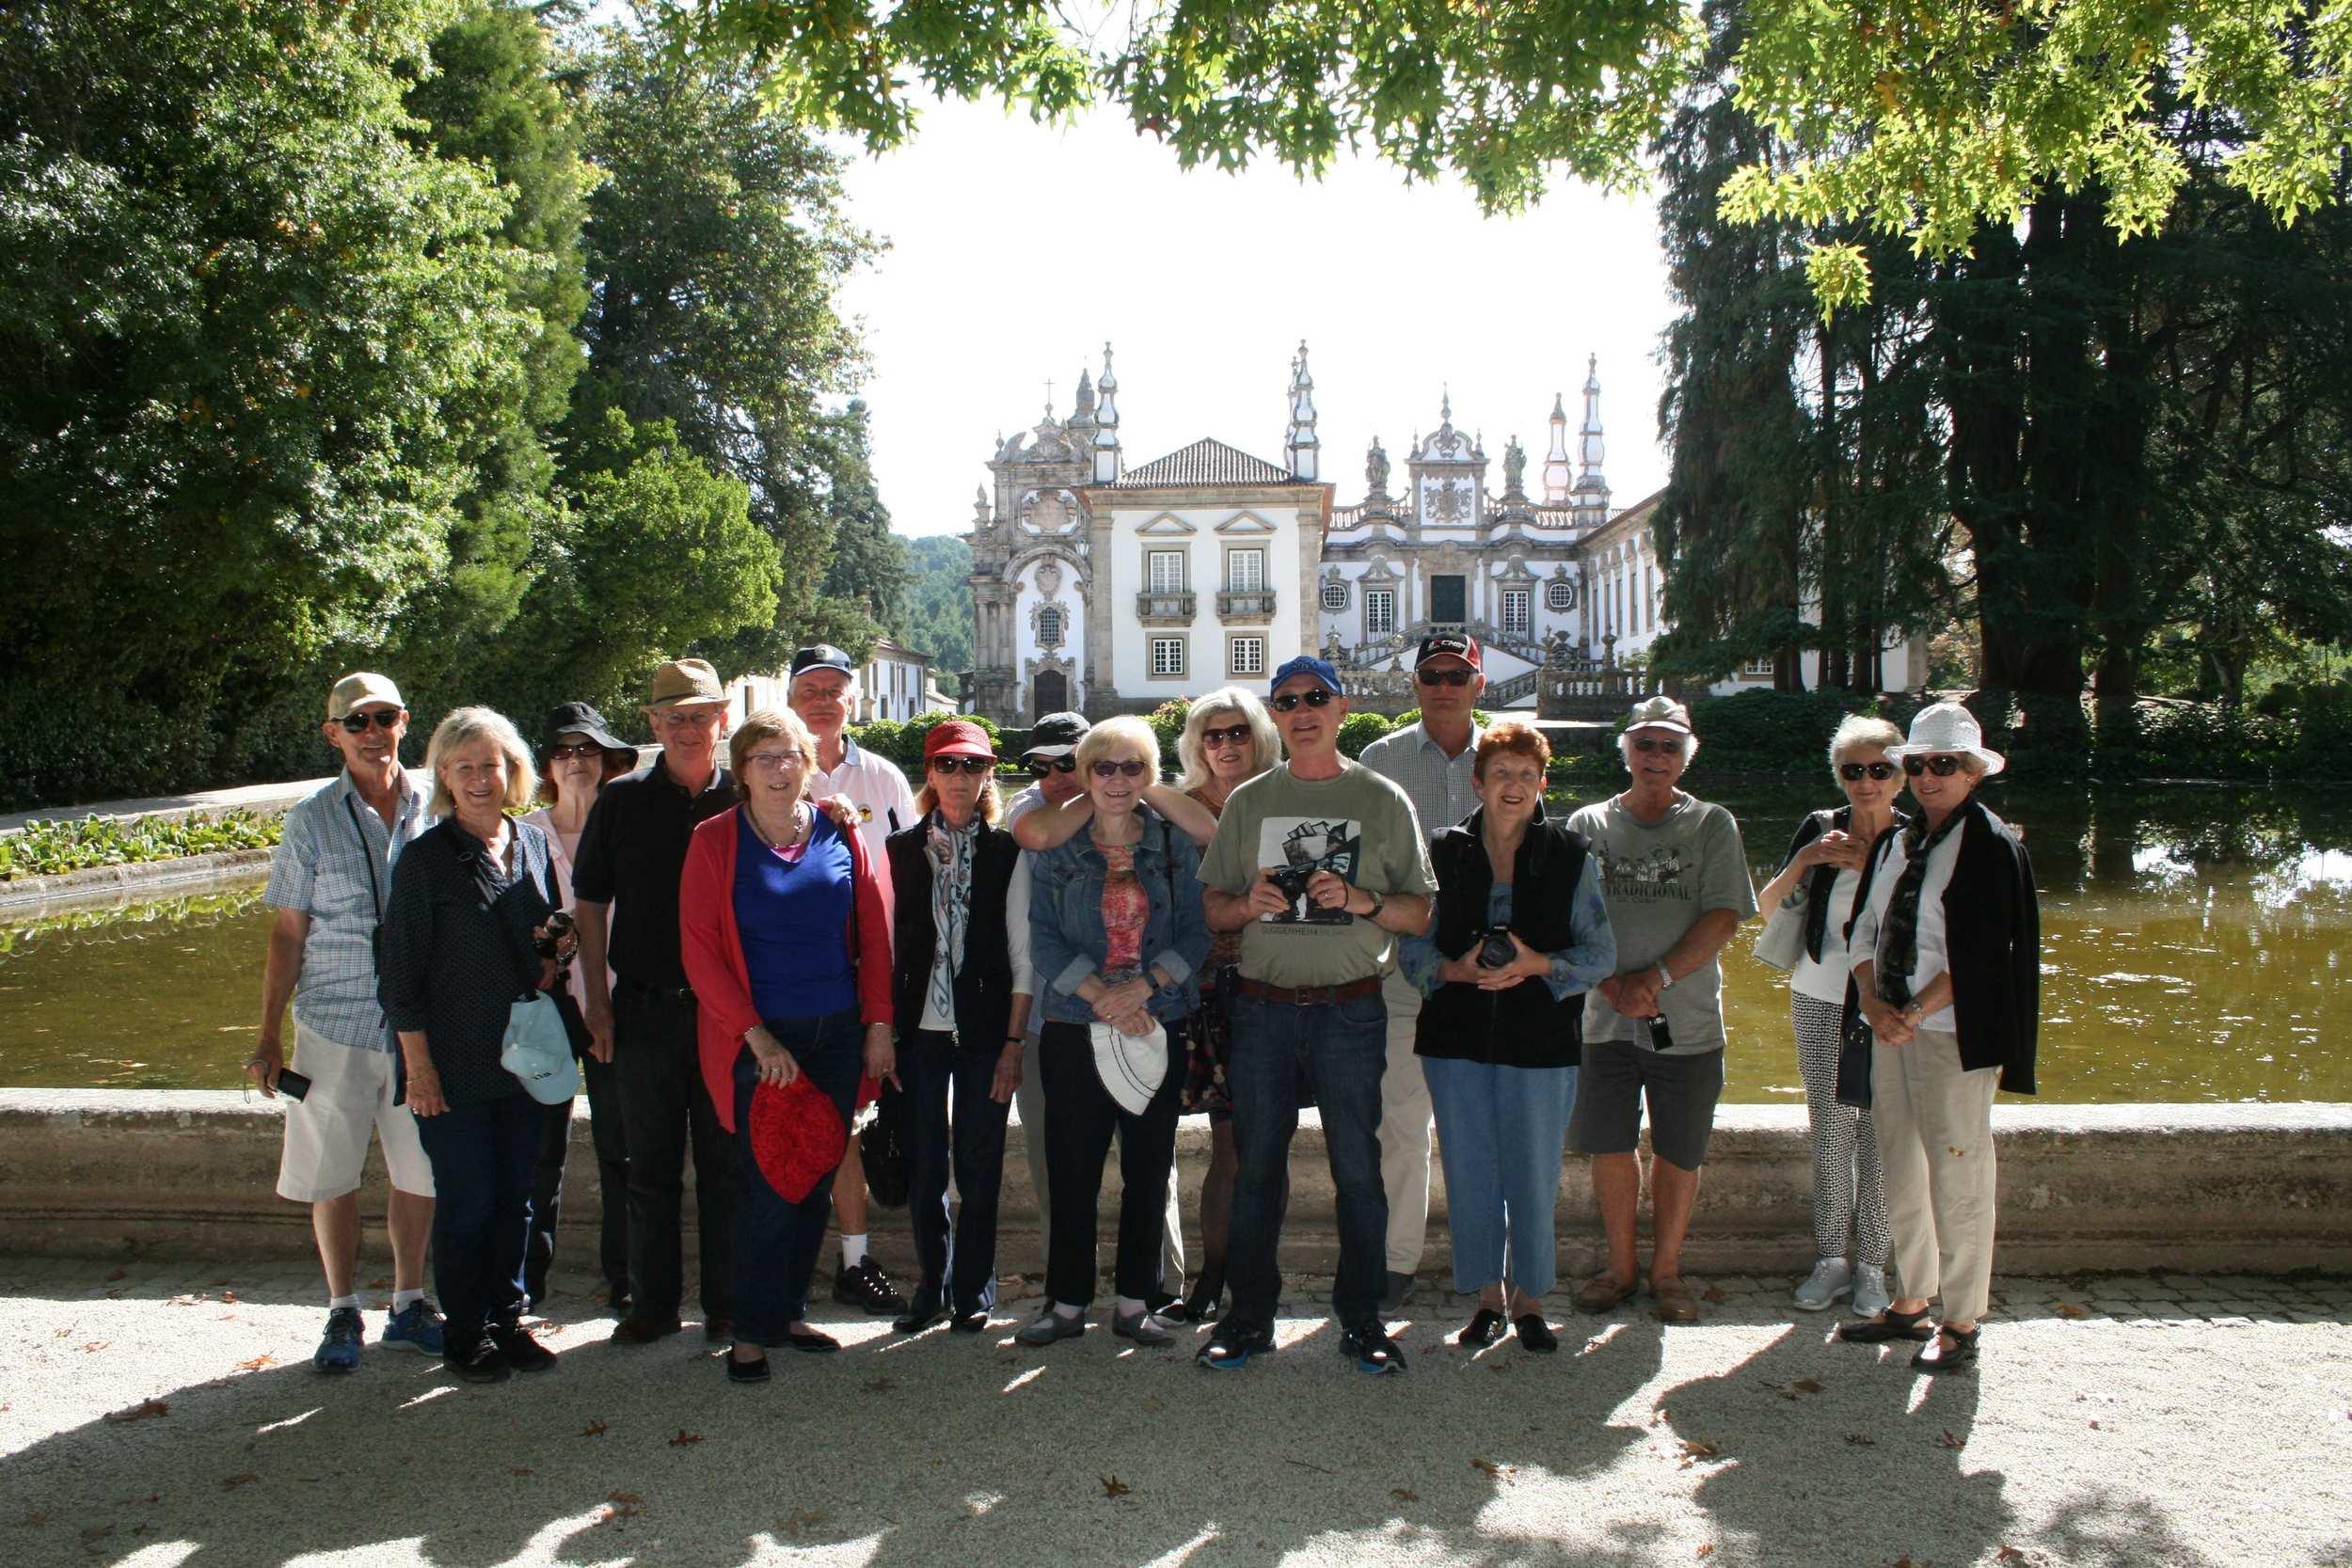 ANCIENT KINGDOMS OF SPAIN & PORTUGAL - 2015 - ON TOUR